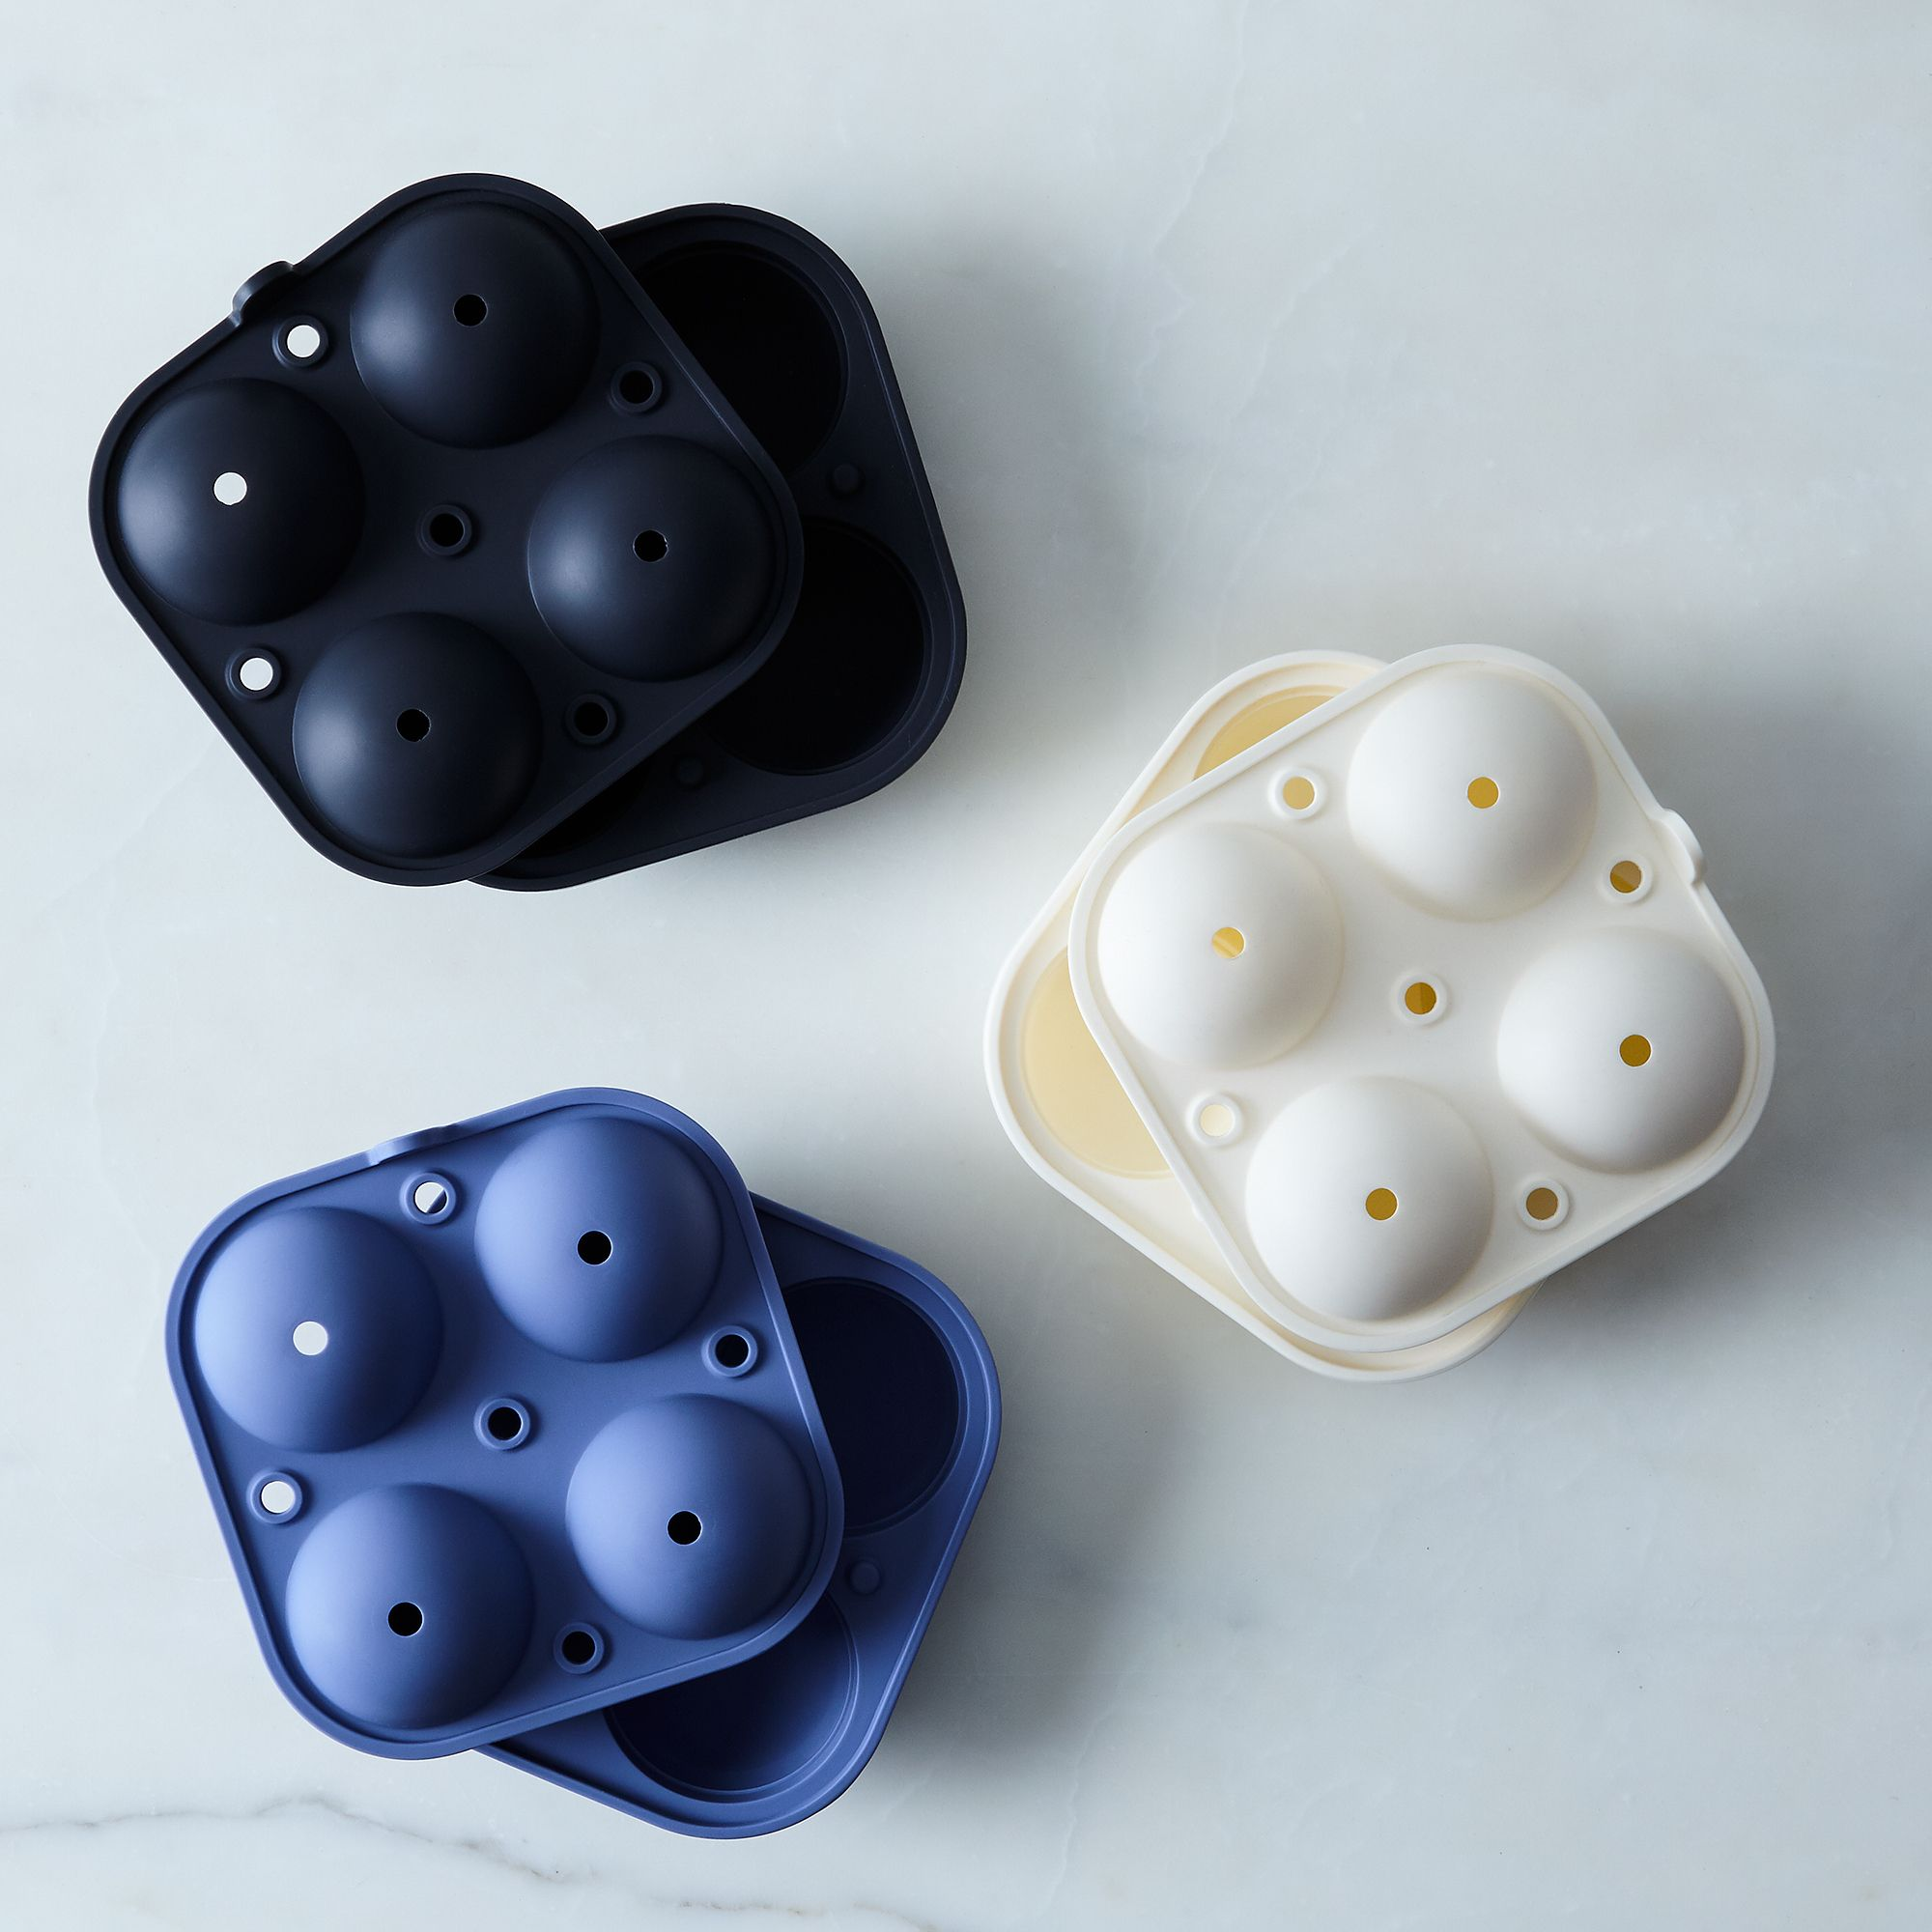 A996e6d8 e562 4911 89a9 72cd382102a6  2016 1111 w p design sphere ice cube trays variety pack silo rocky luten 0146